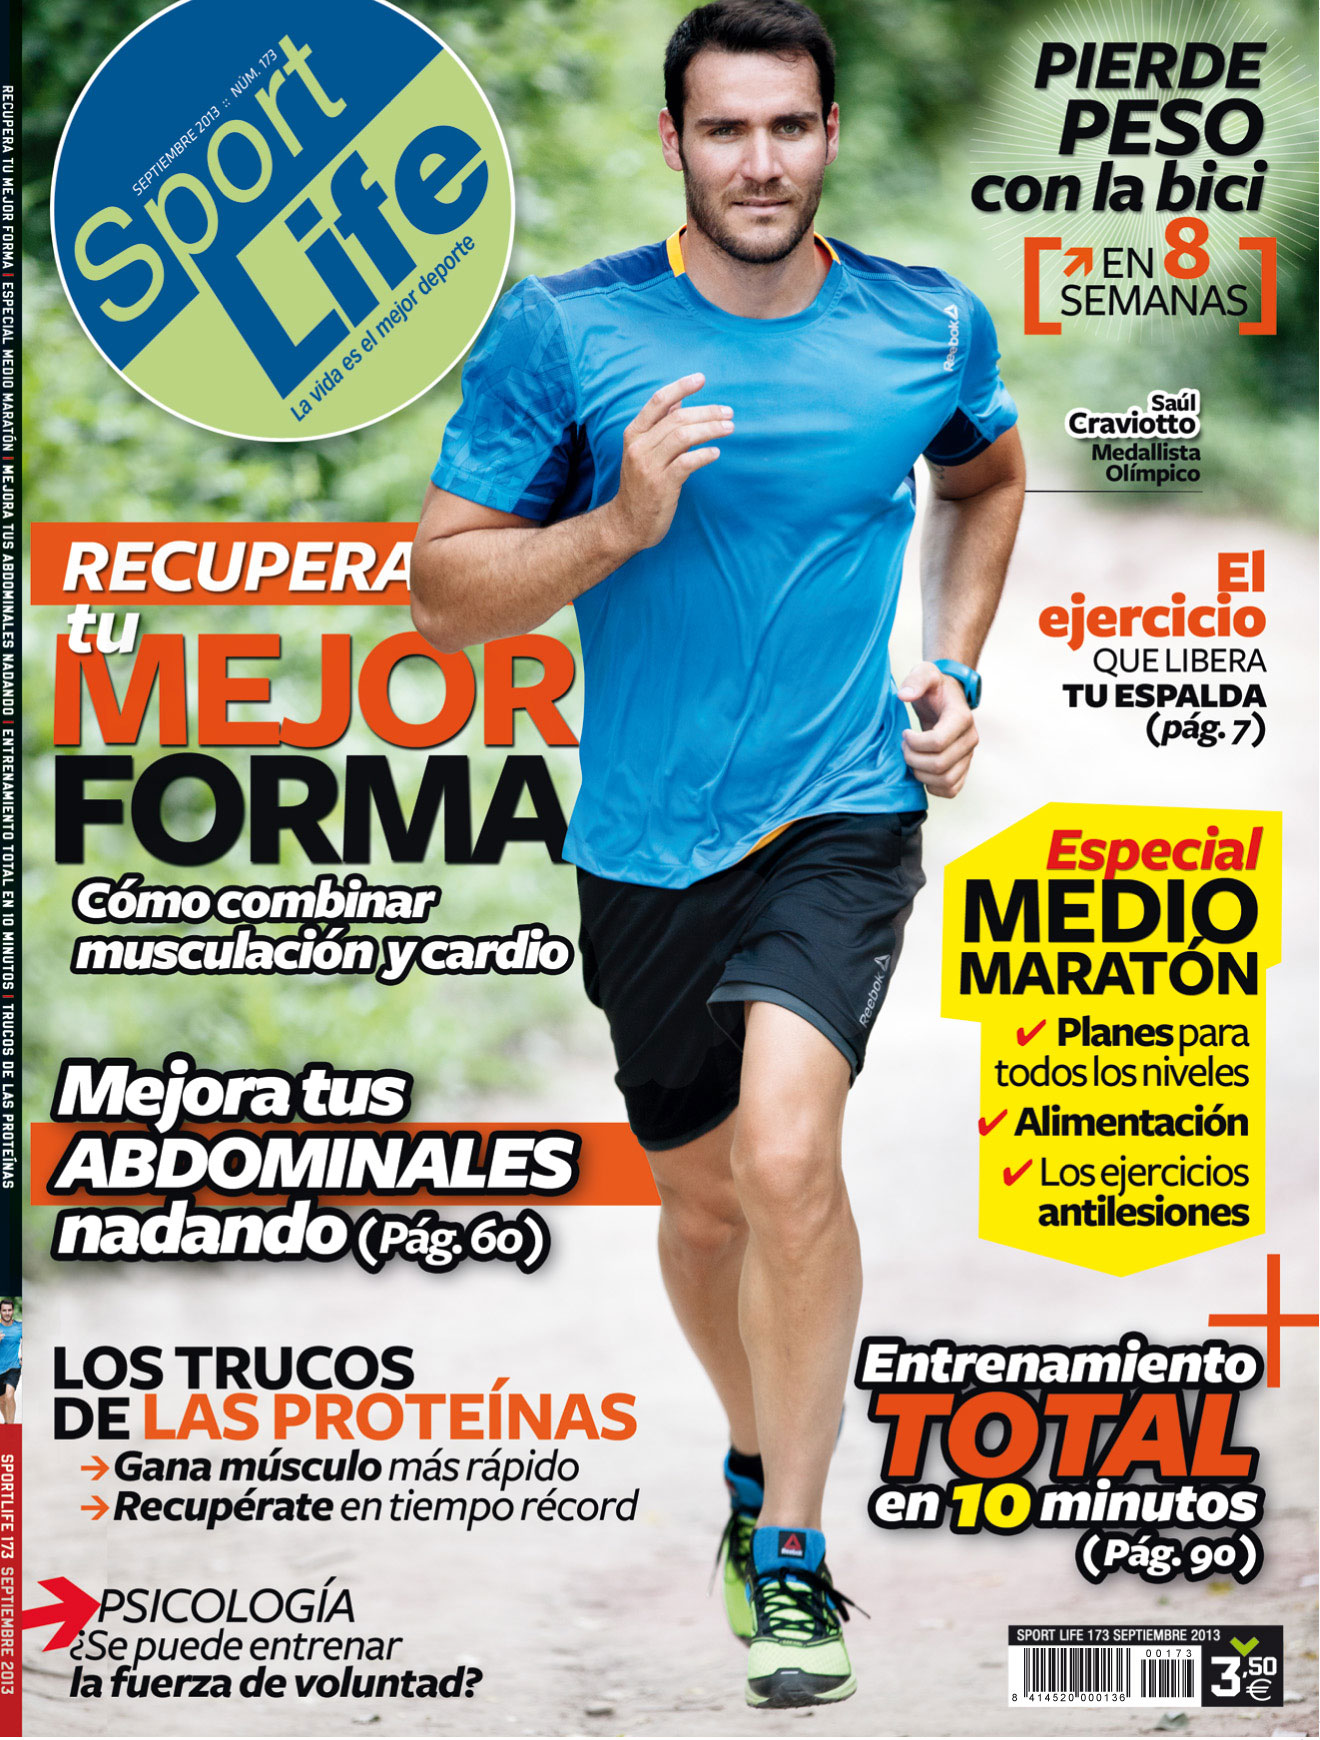 Sumario Sport Life 173 Septiembre 2013